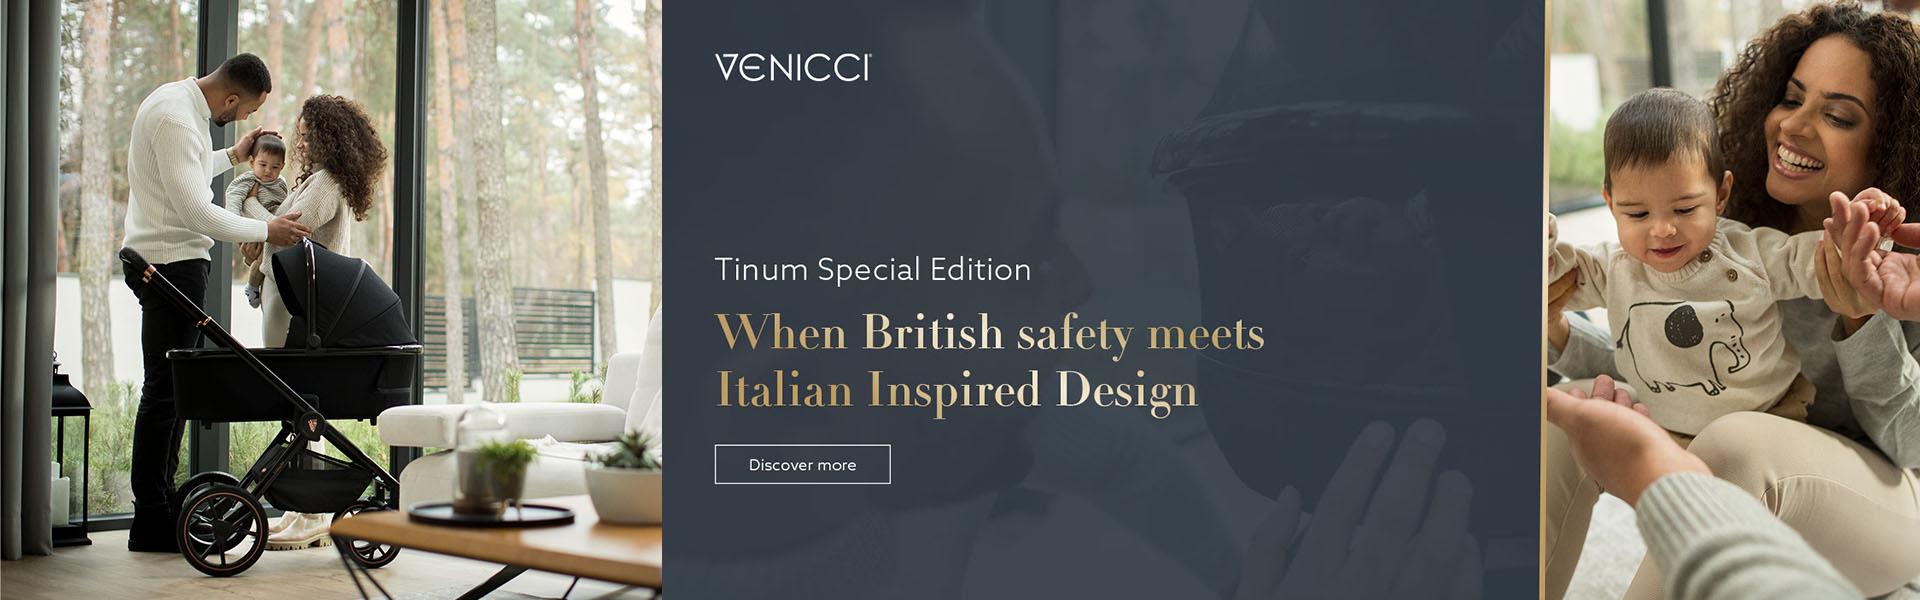 venicci tinum special edition